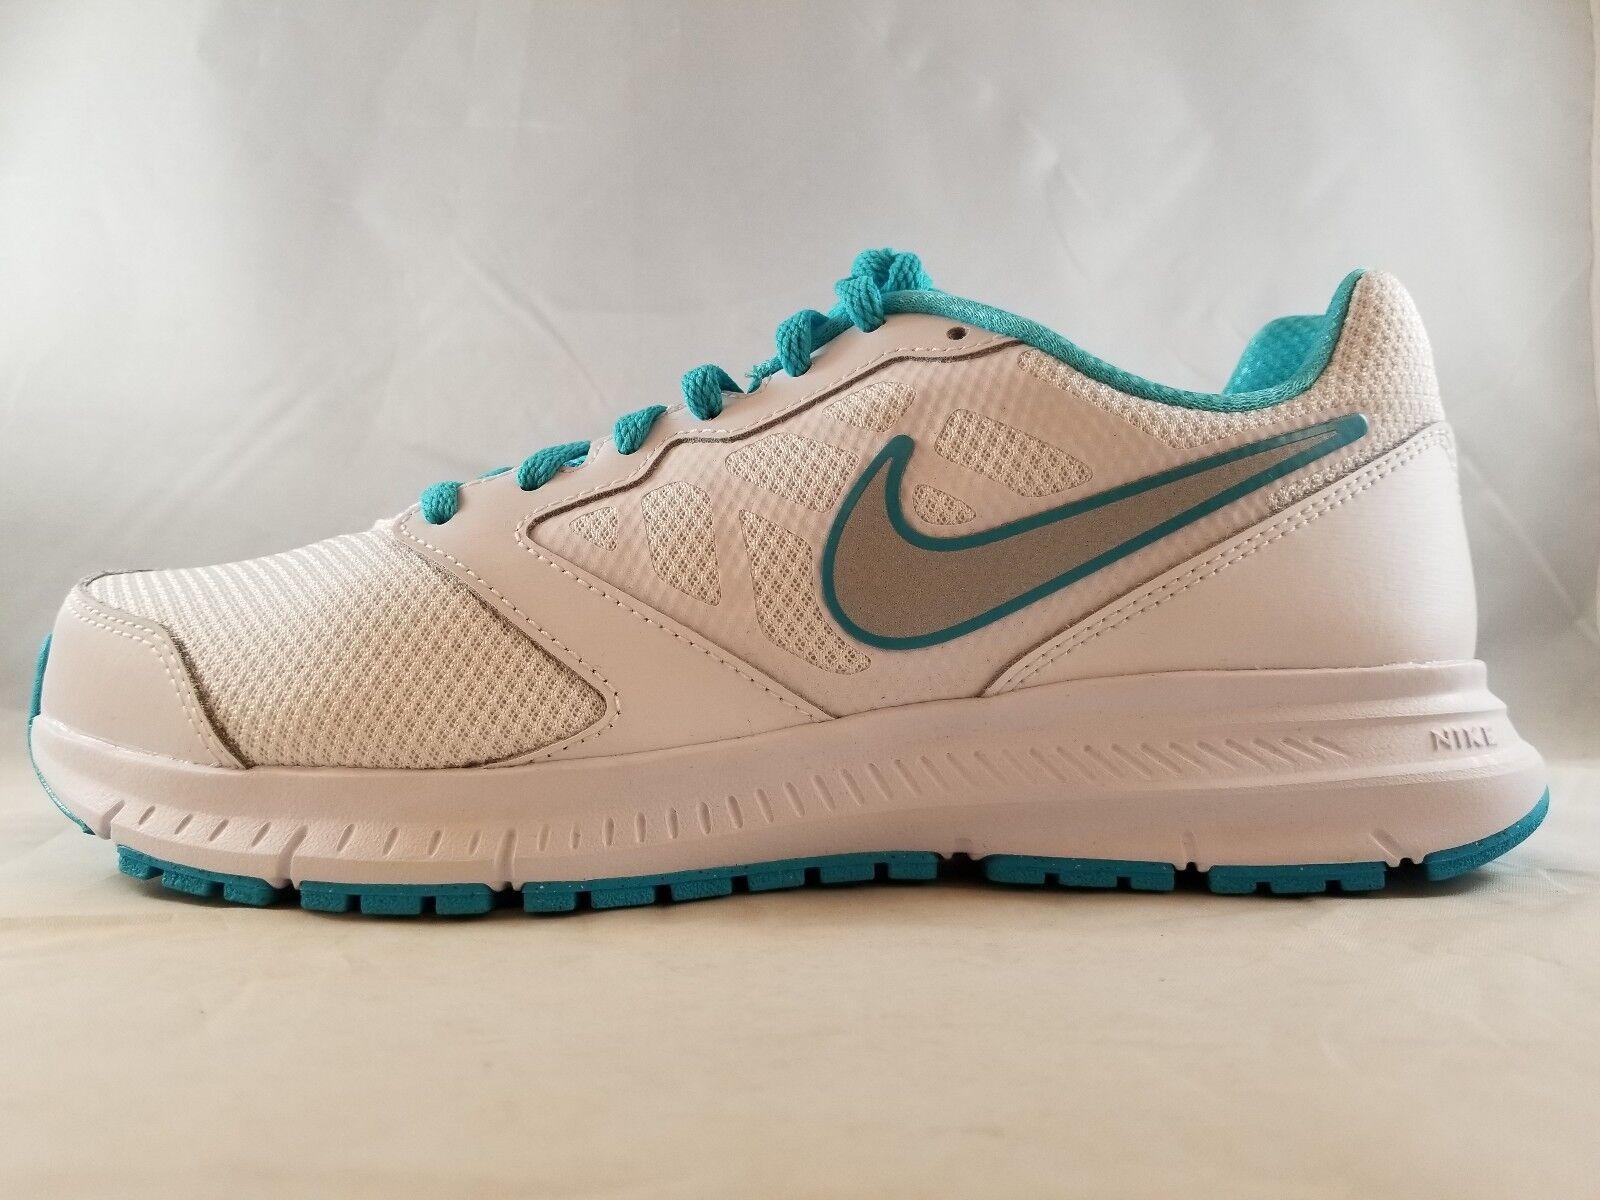 Nike Downshifter 6 Women's Running shoes 684765 111 Size 10 10 10 2a1083